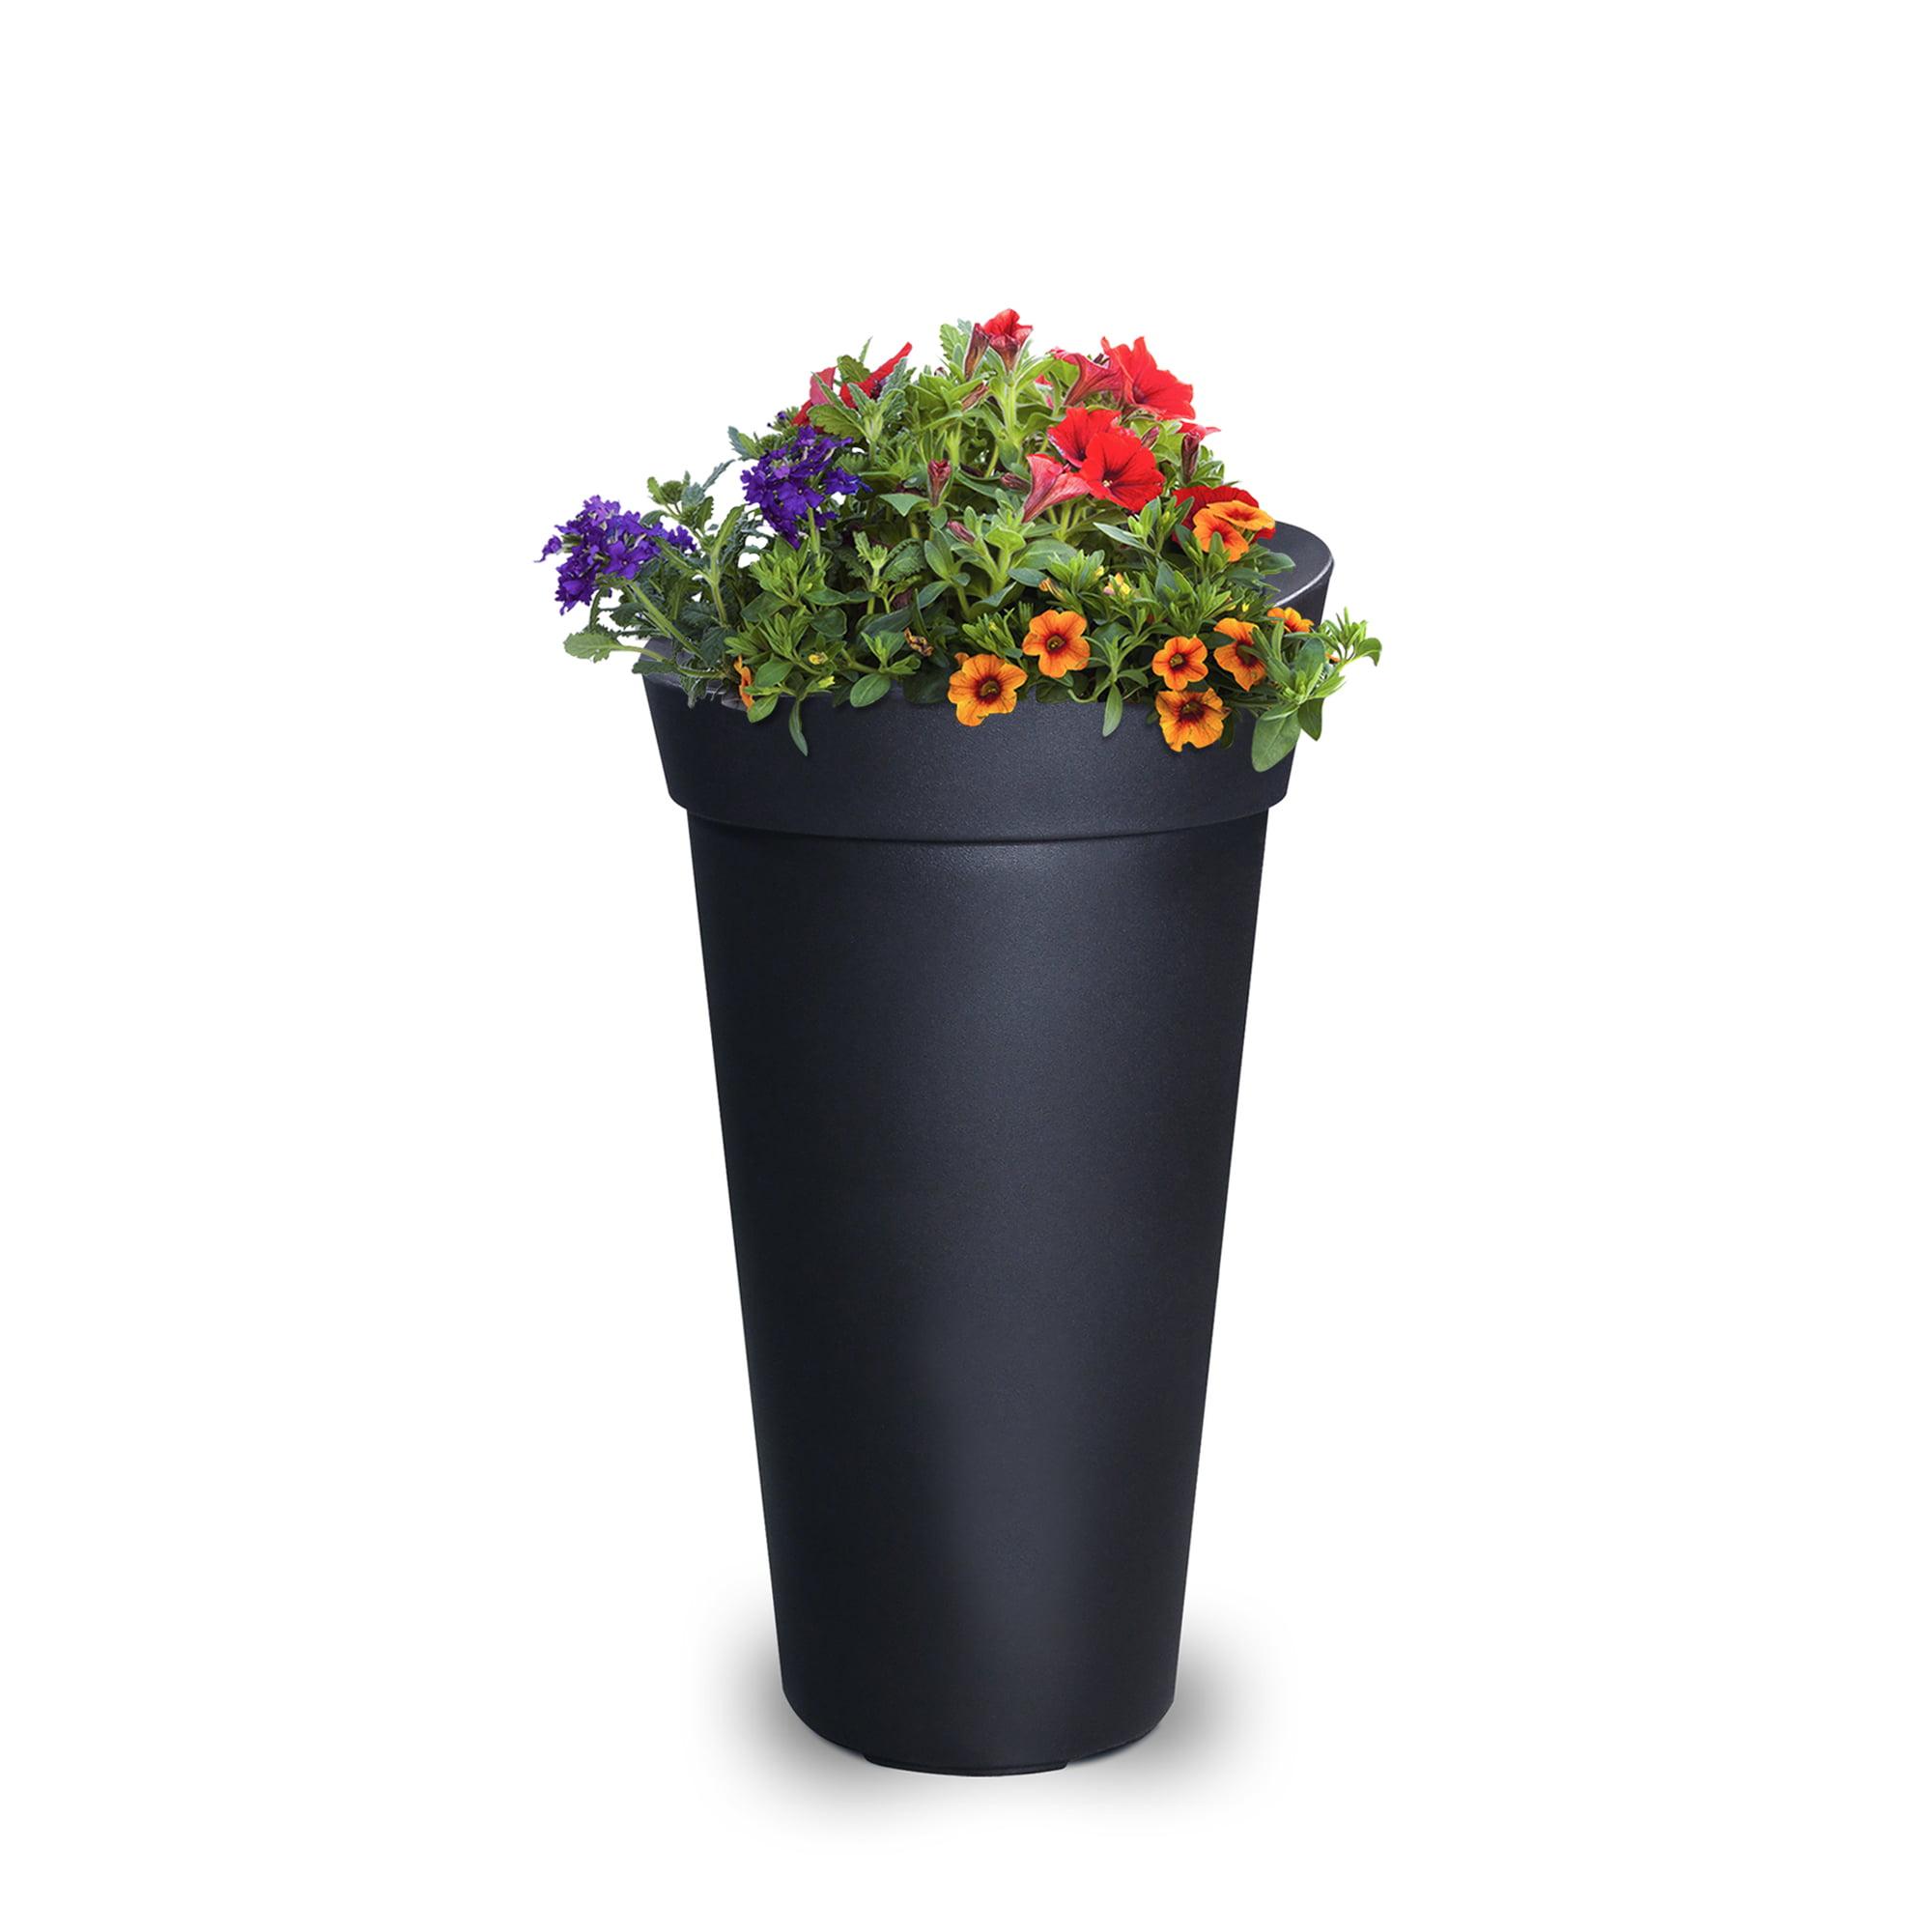 Creston Tall Planter Black by Mayne Inc.